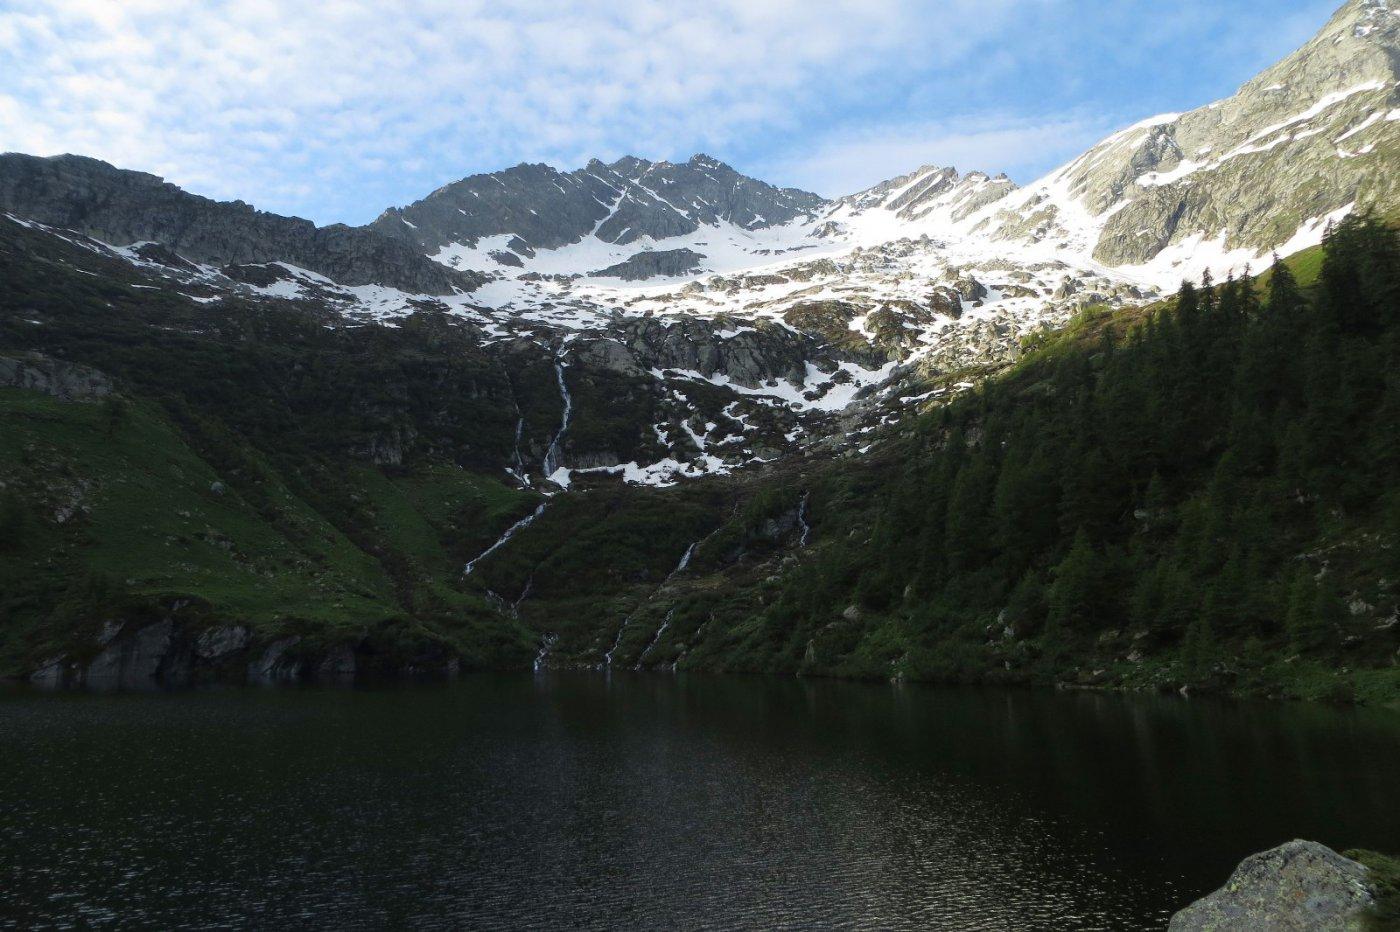 Arrivo al lago Frudiera